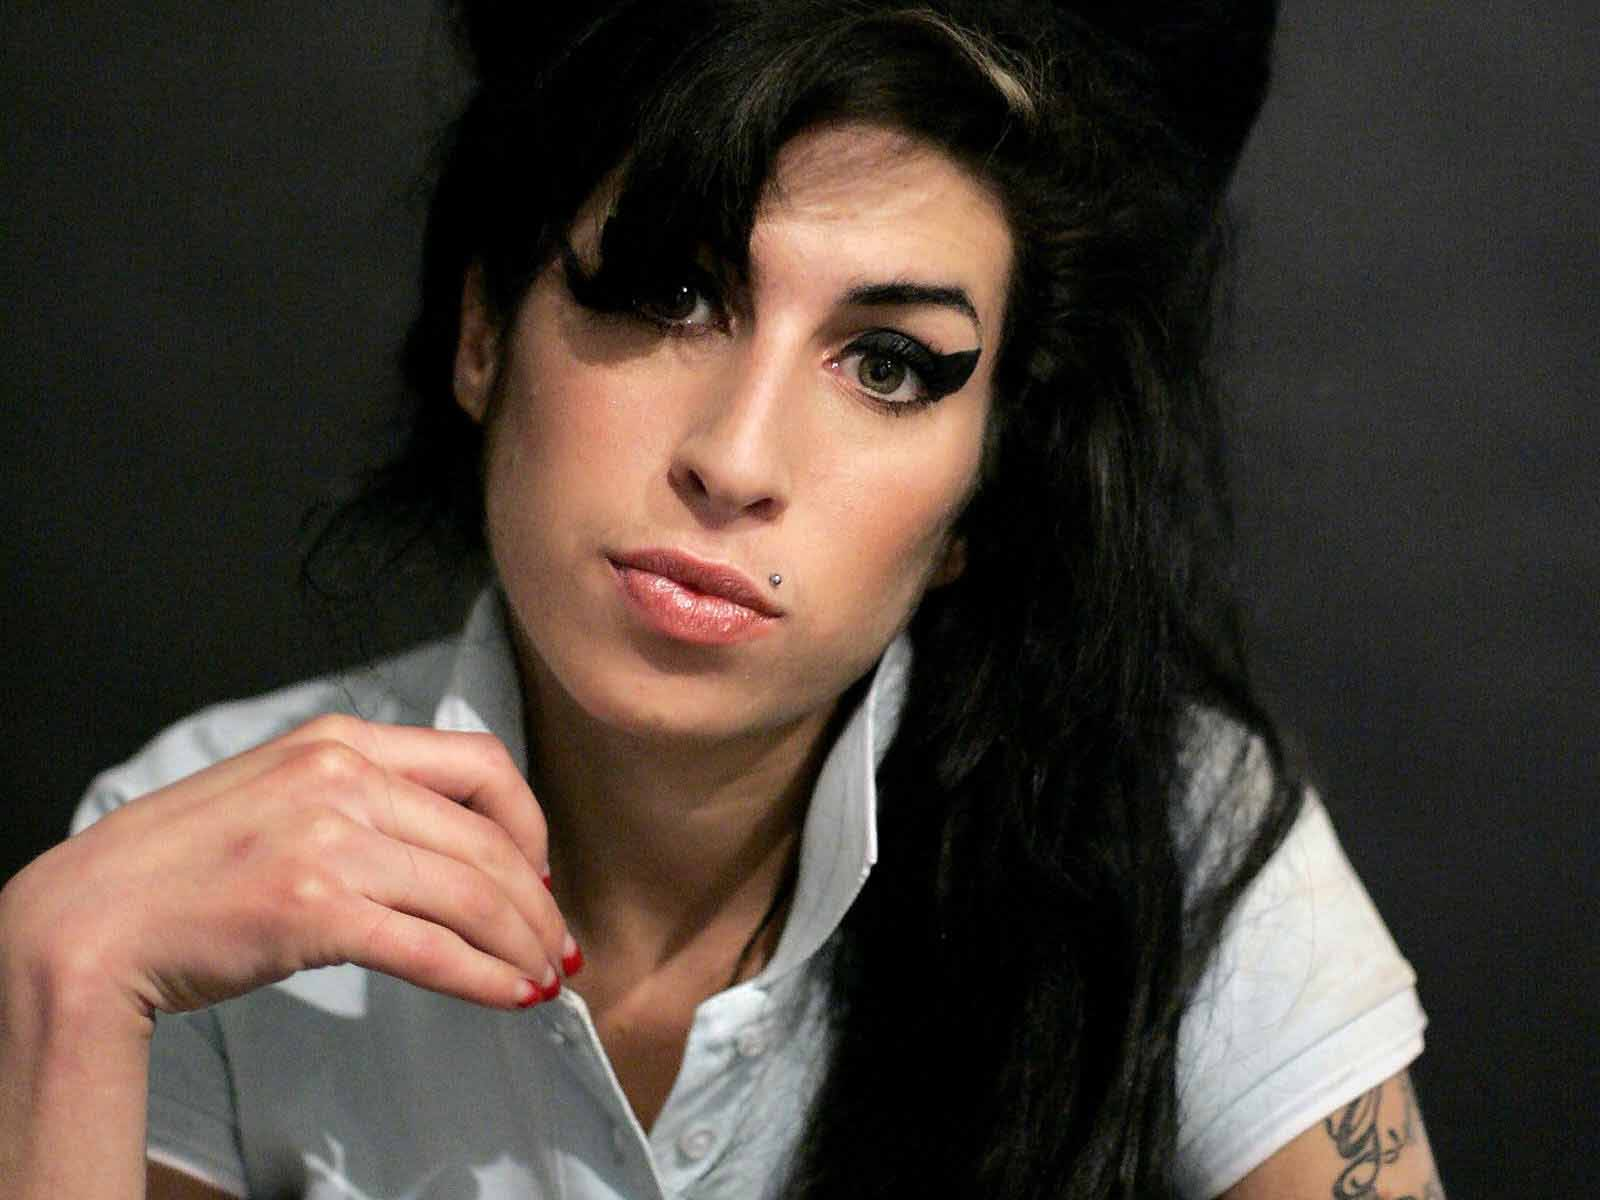 http://2.bp.blogspot.com/-efplr9KwPvE/Ti9JCHuwy1I/AAAAAAAAzhI/ATYE5J0Ru9U/s1600/Amy+Winehouse.jpg